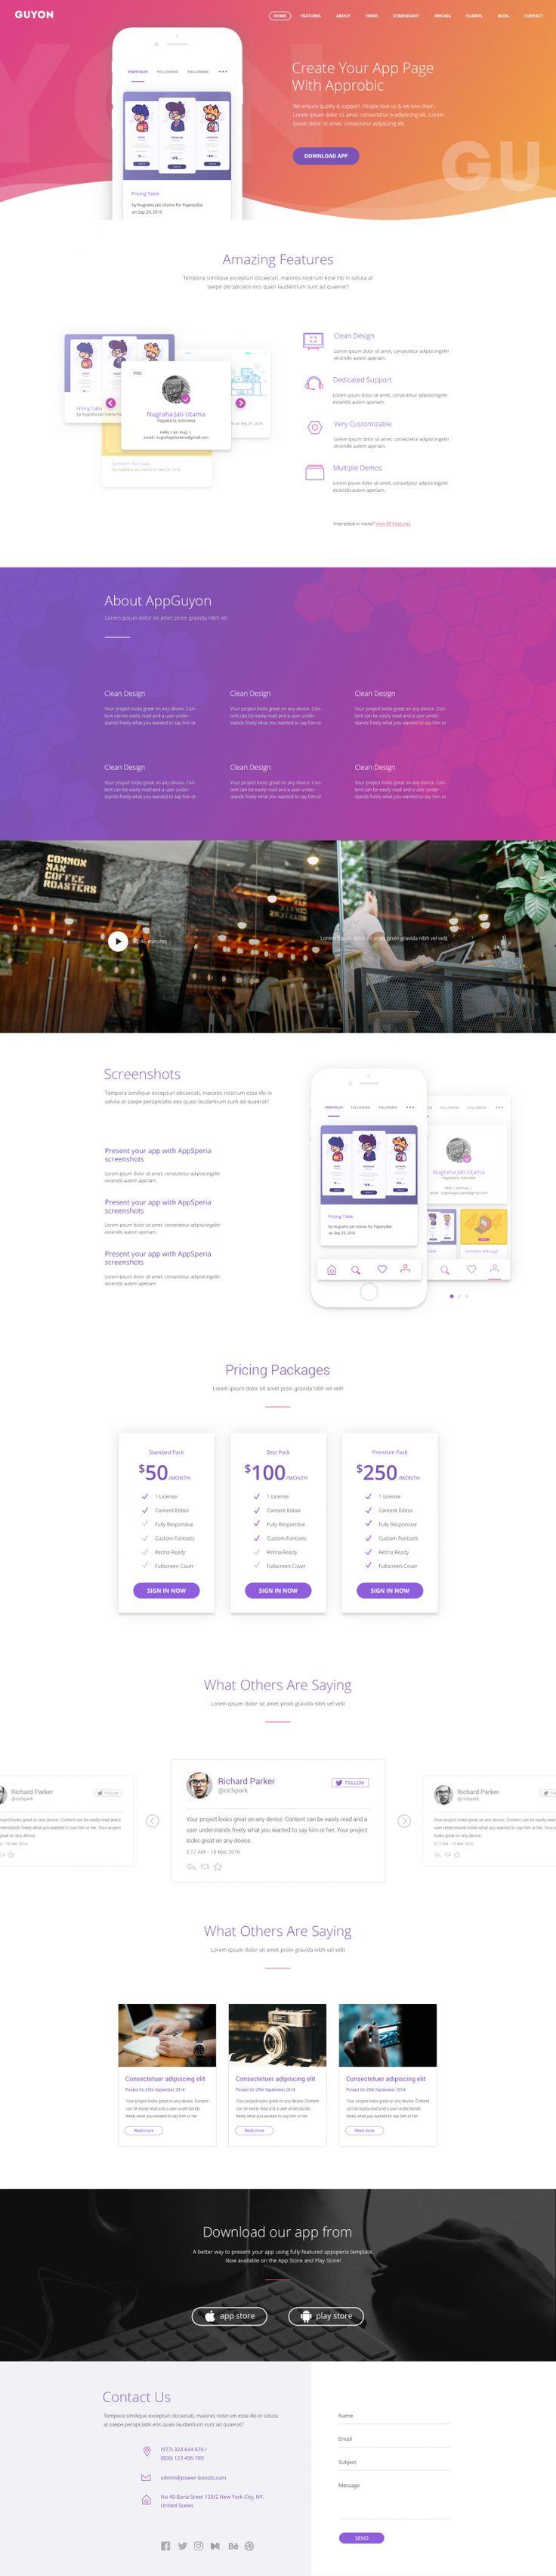 Guyon Homepage by Nugraha Jati Utama